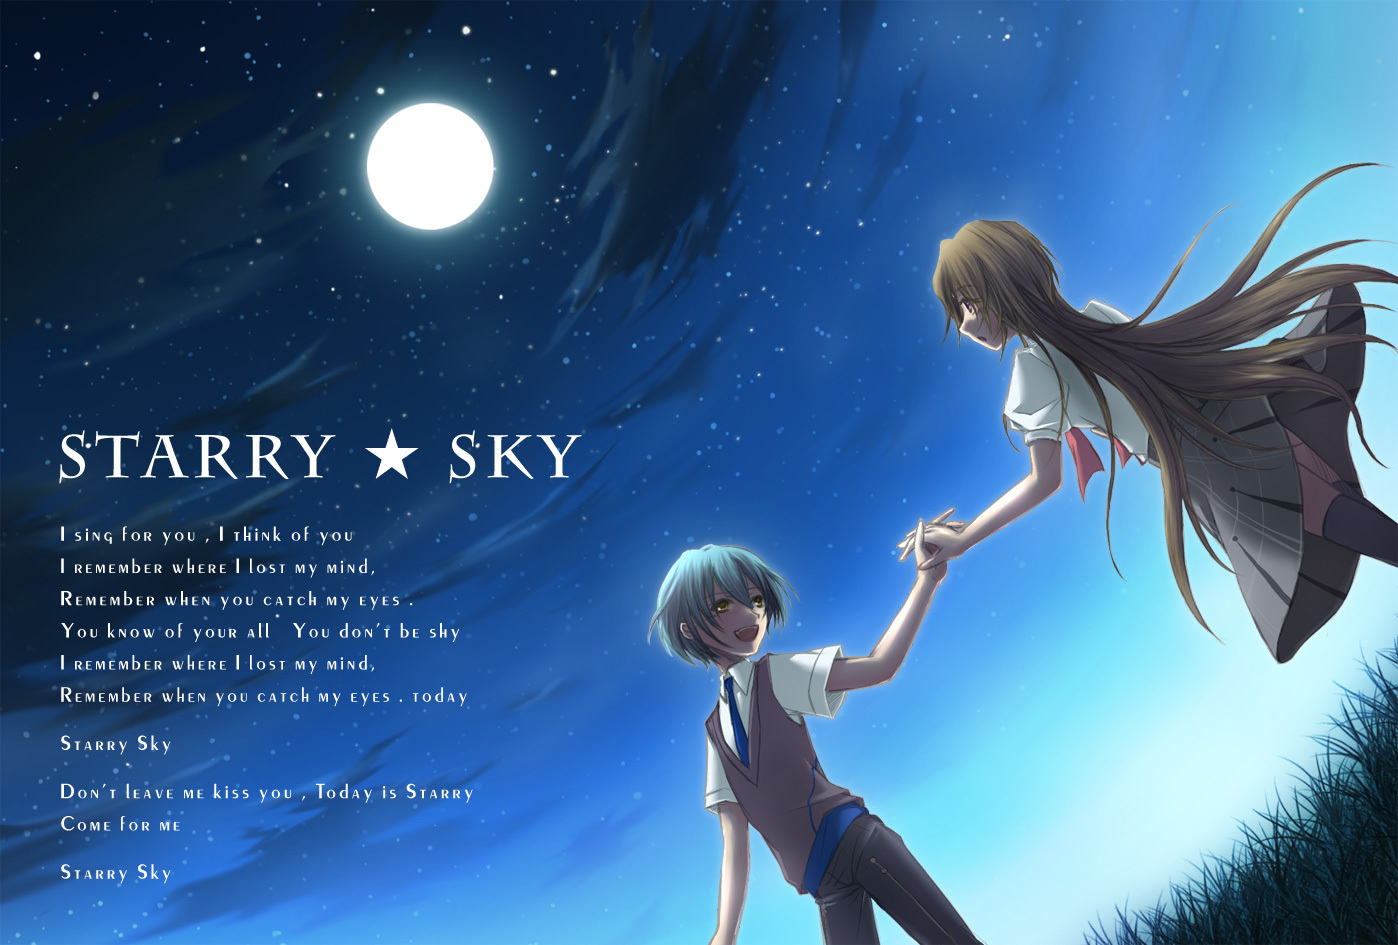 Starry Sky picture Tsukiko-x-Homare-starry-sky-17106855-1398-945